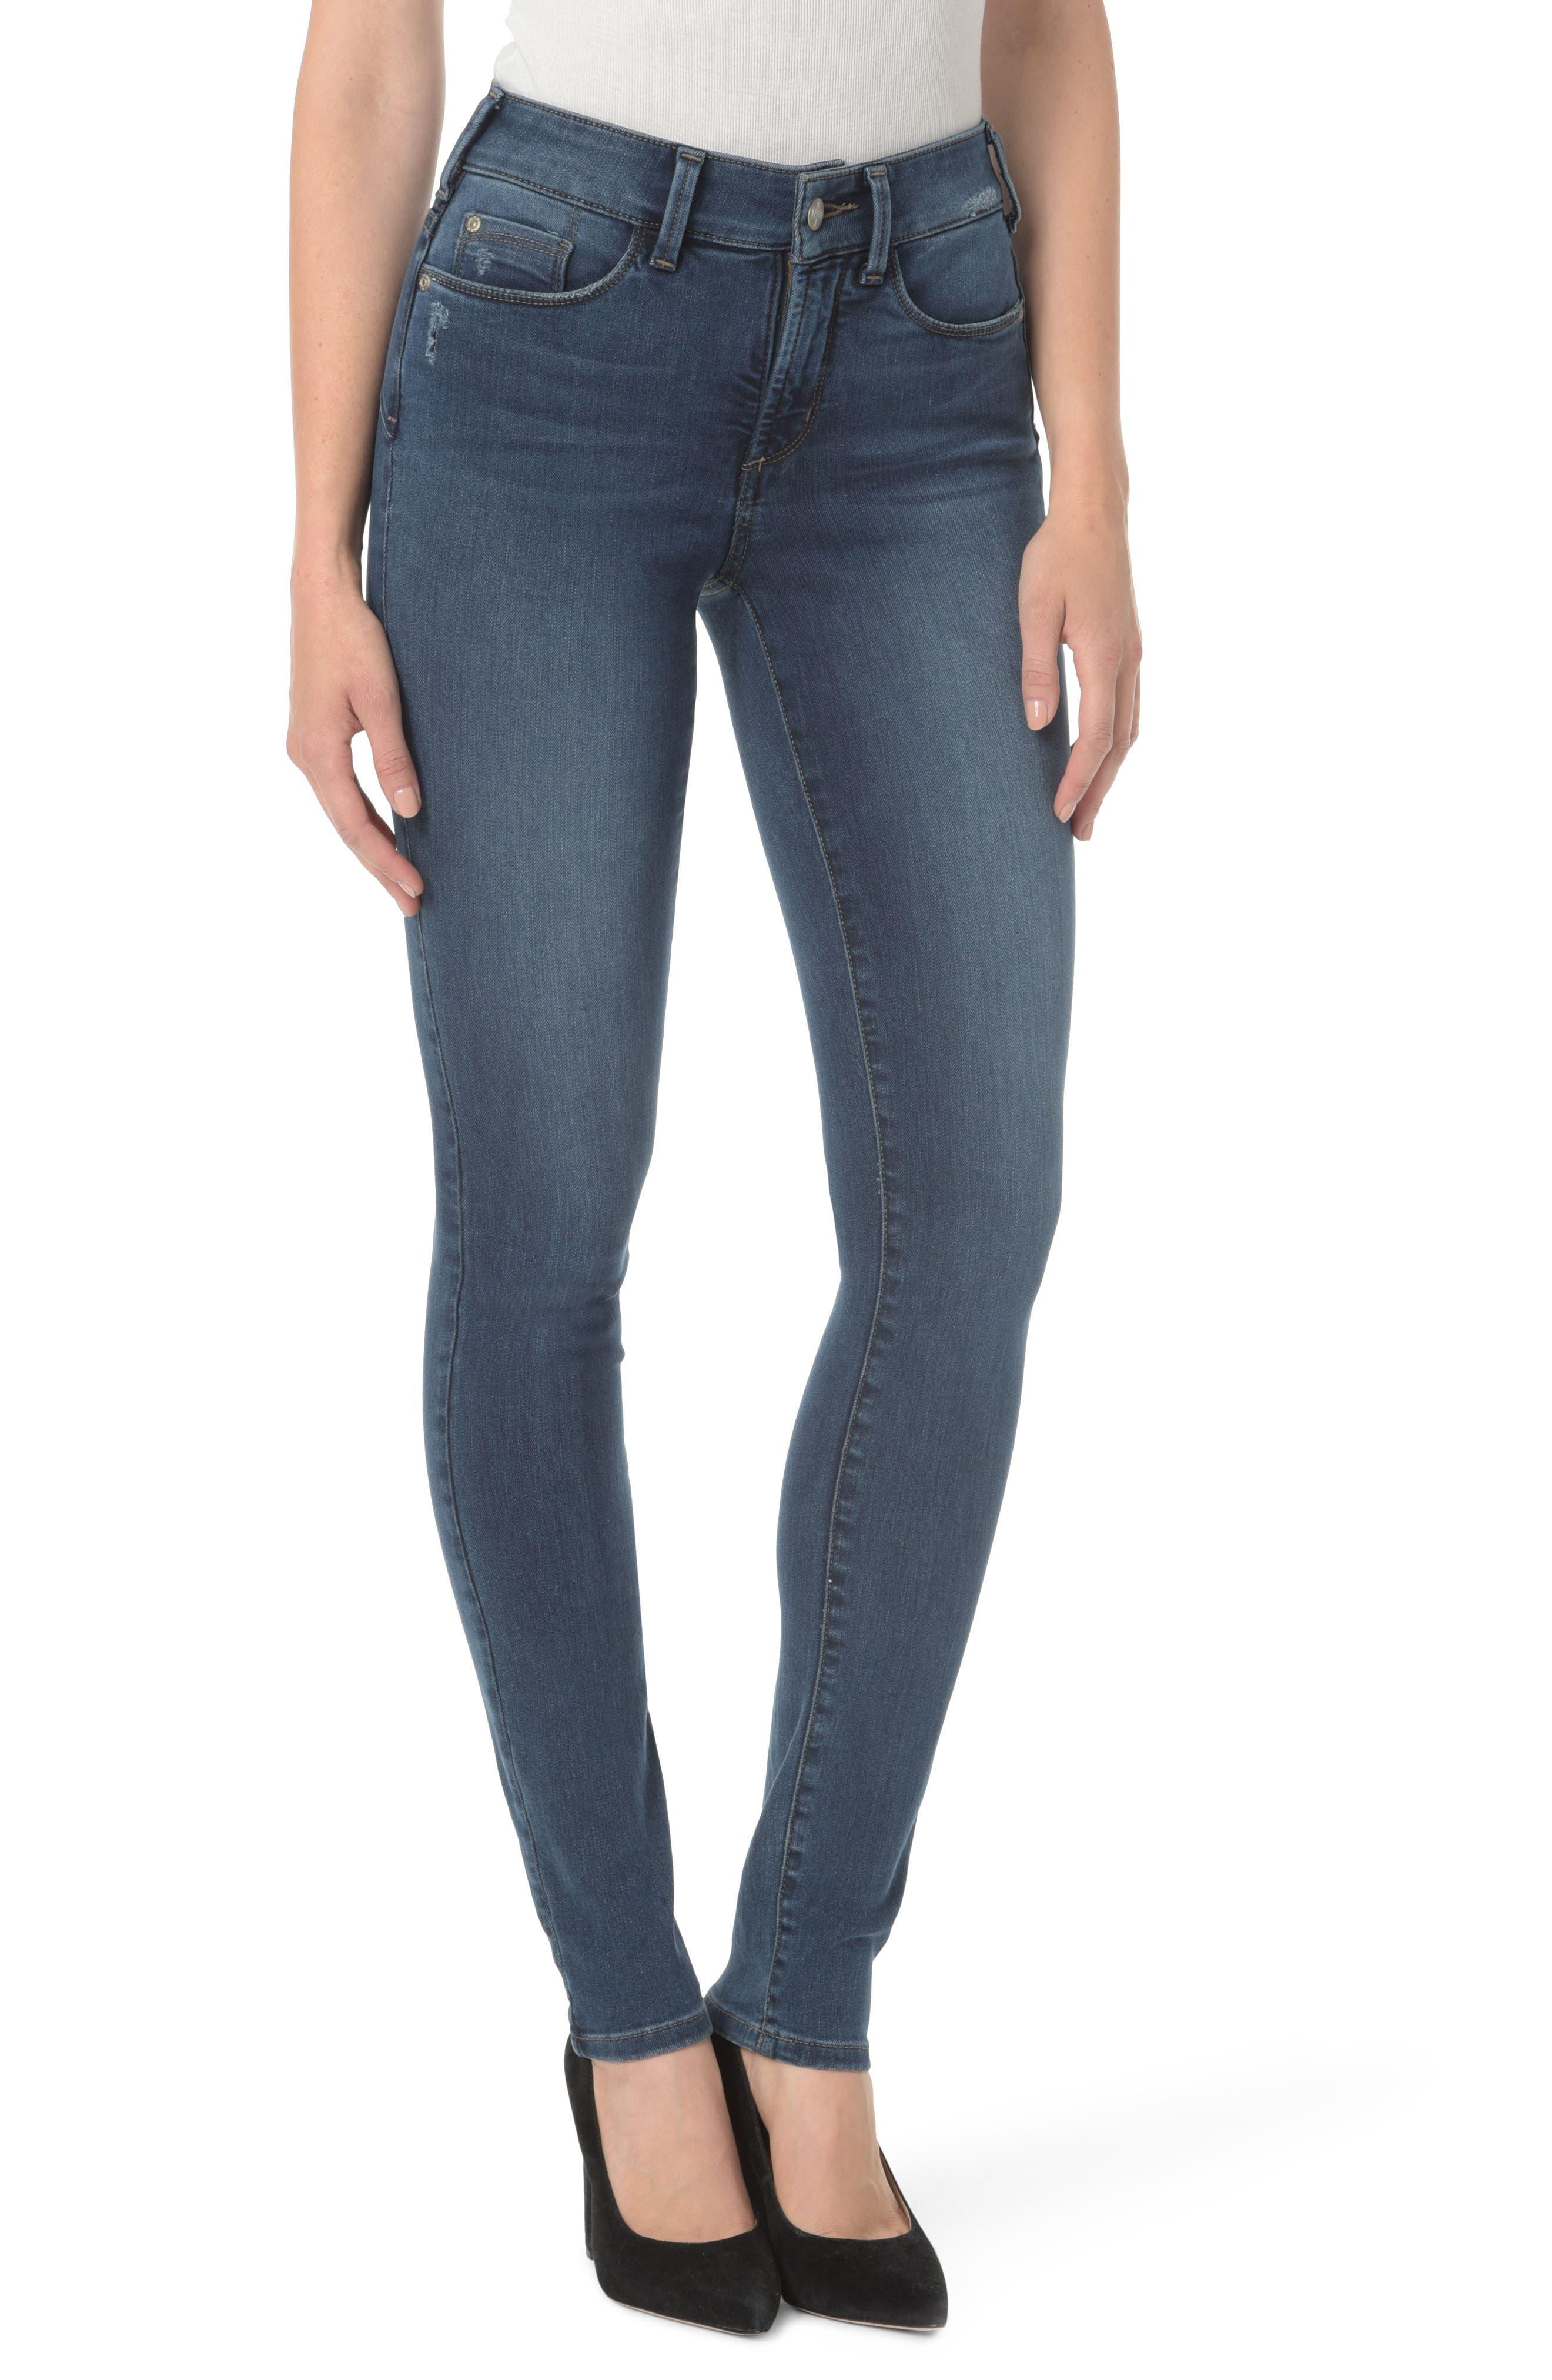 Alina Uplift Stretch Skinny Jeans,                             Main thumbnail 1, color,                             Traveler